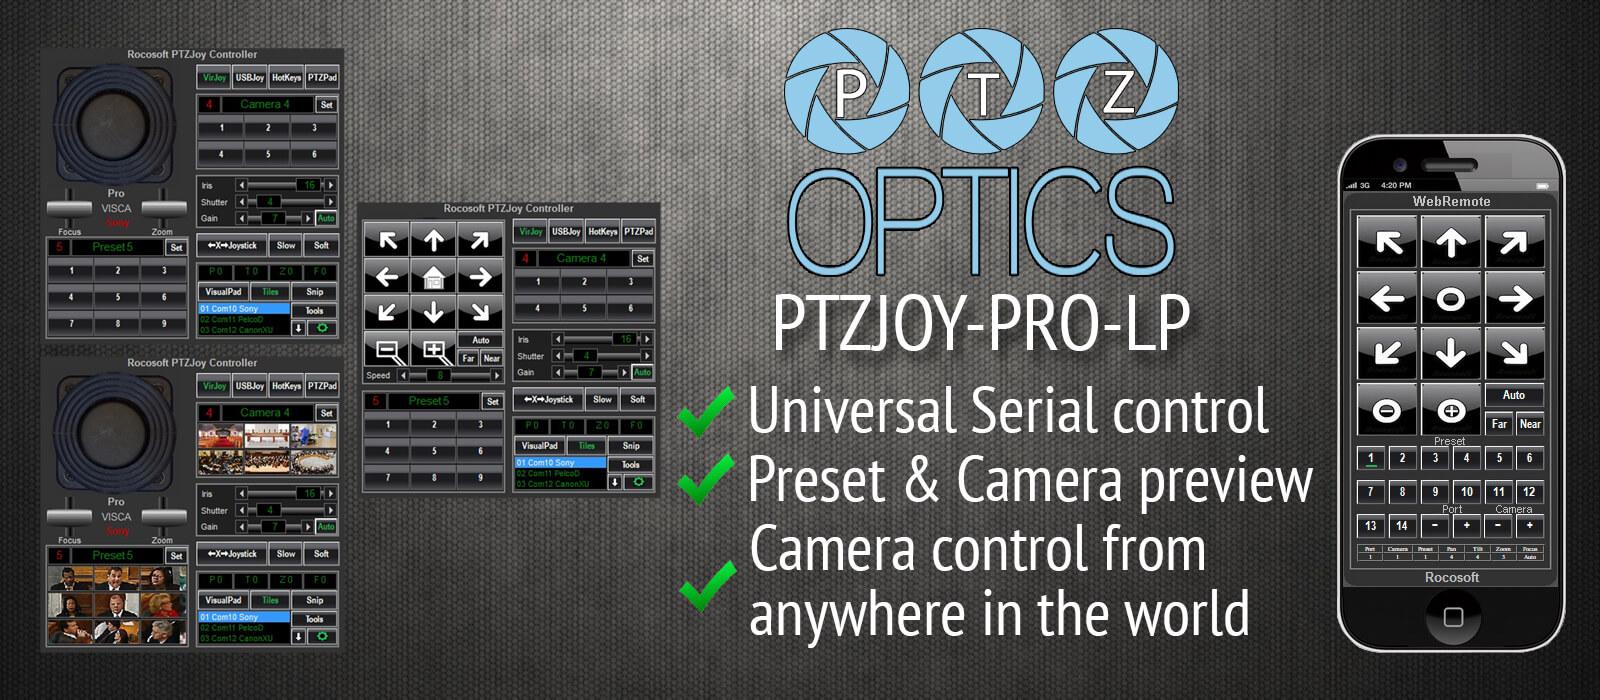 Ptzoptics tricaster control software basic fandeluxe Images